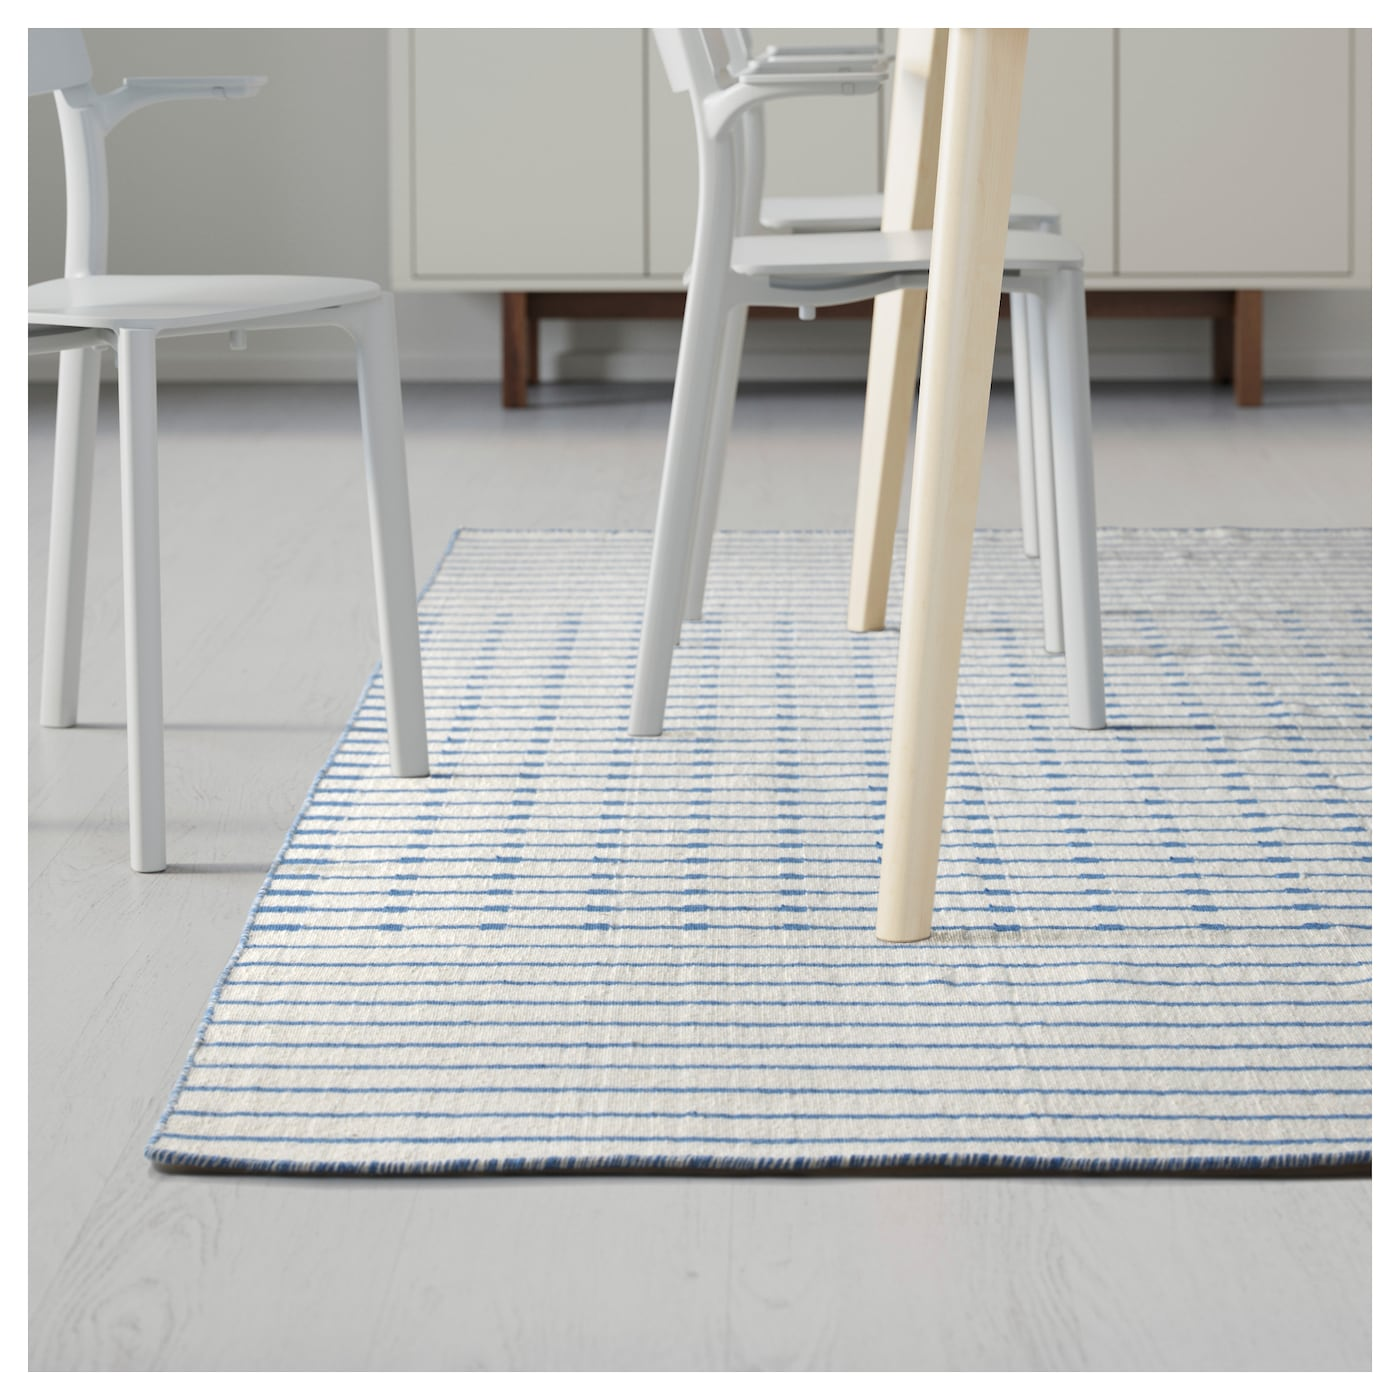 tj reby tapis tiss plat fait main bleu 170x240 cm ikea. Black Bedroom Furniture Sets. Home Design Ideas